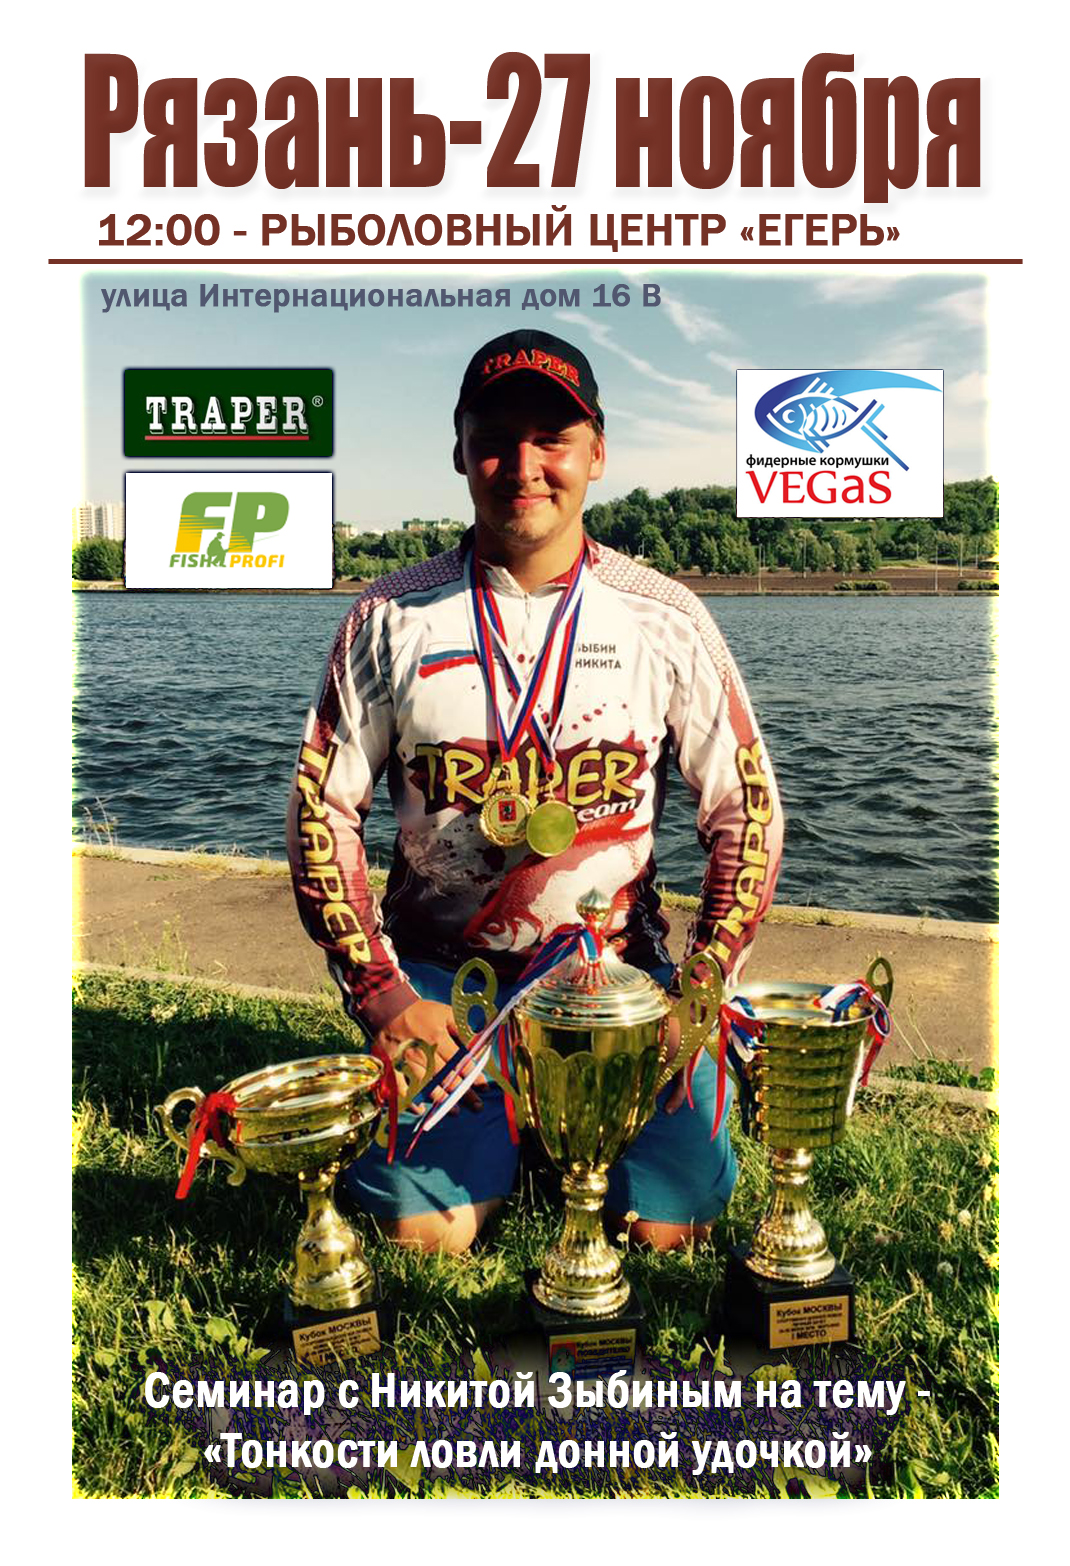 рыбалка в рязани 2016 год